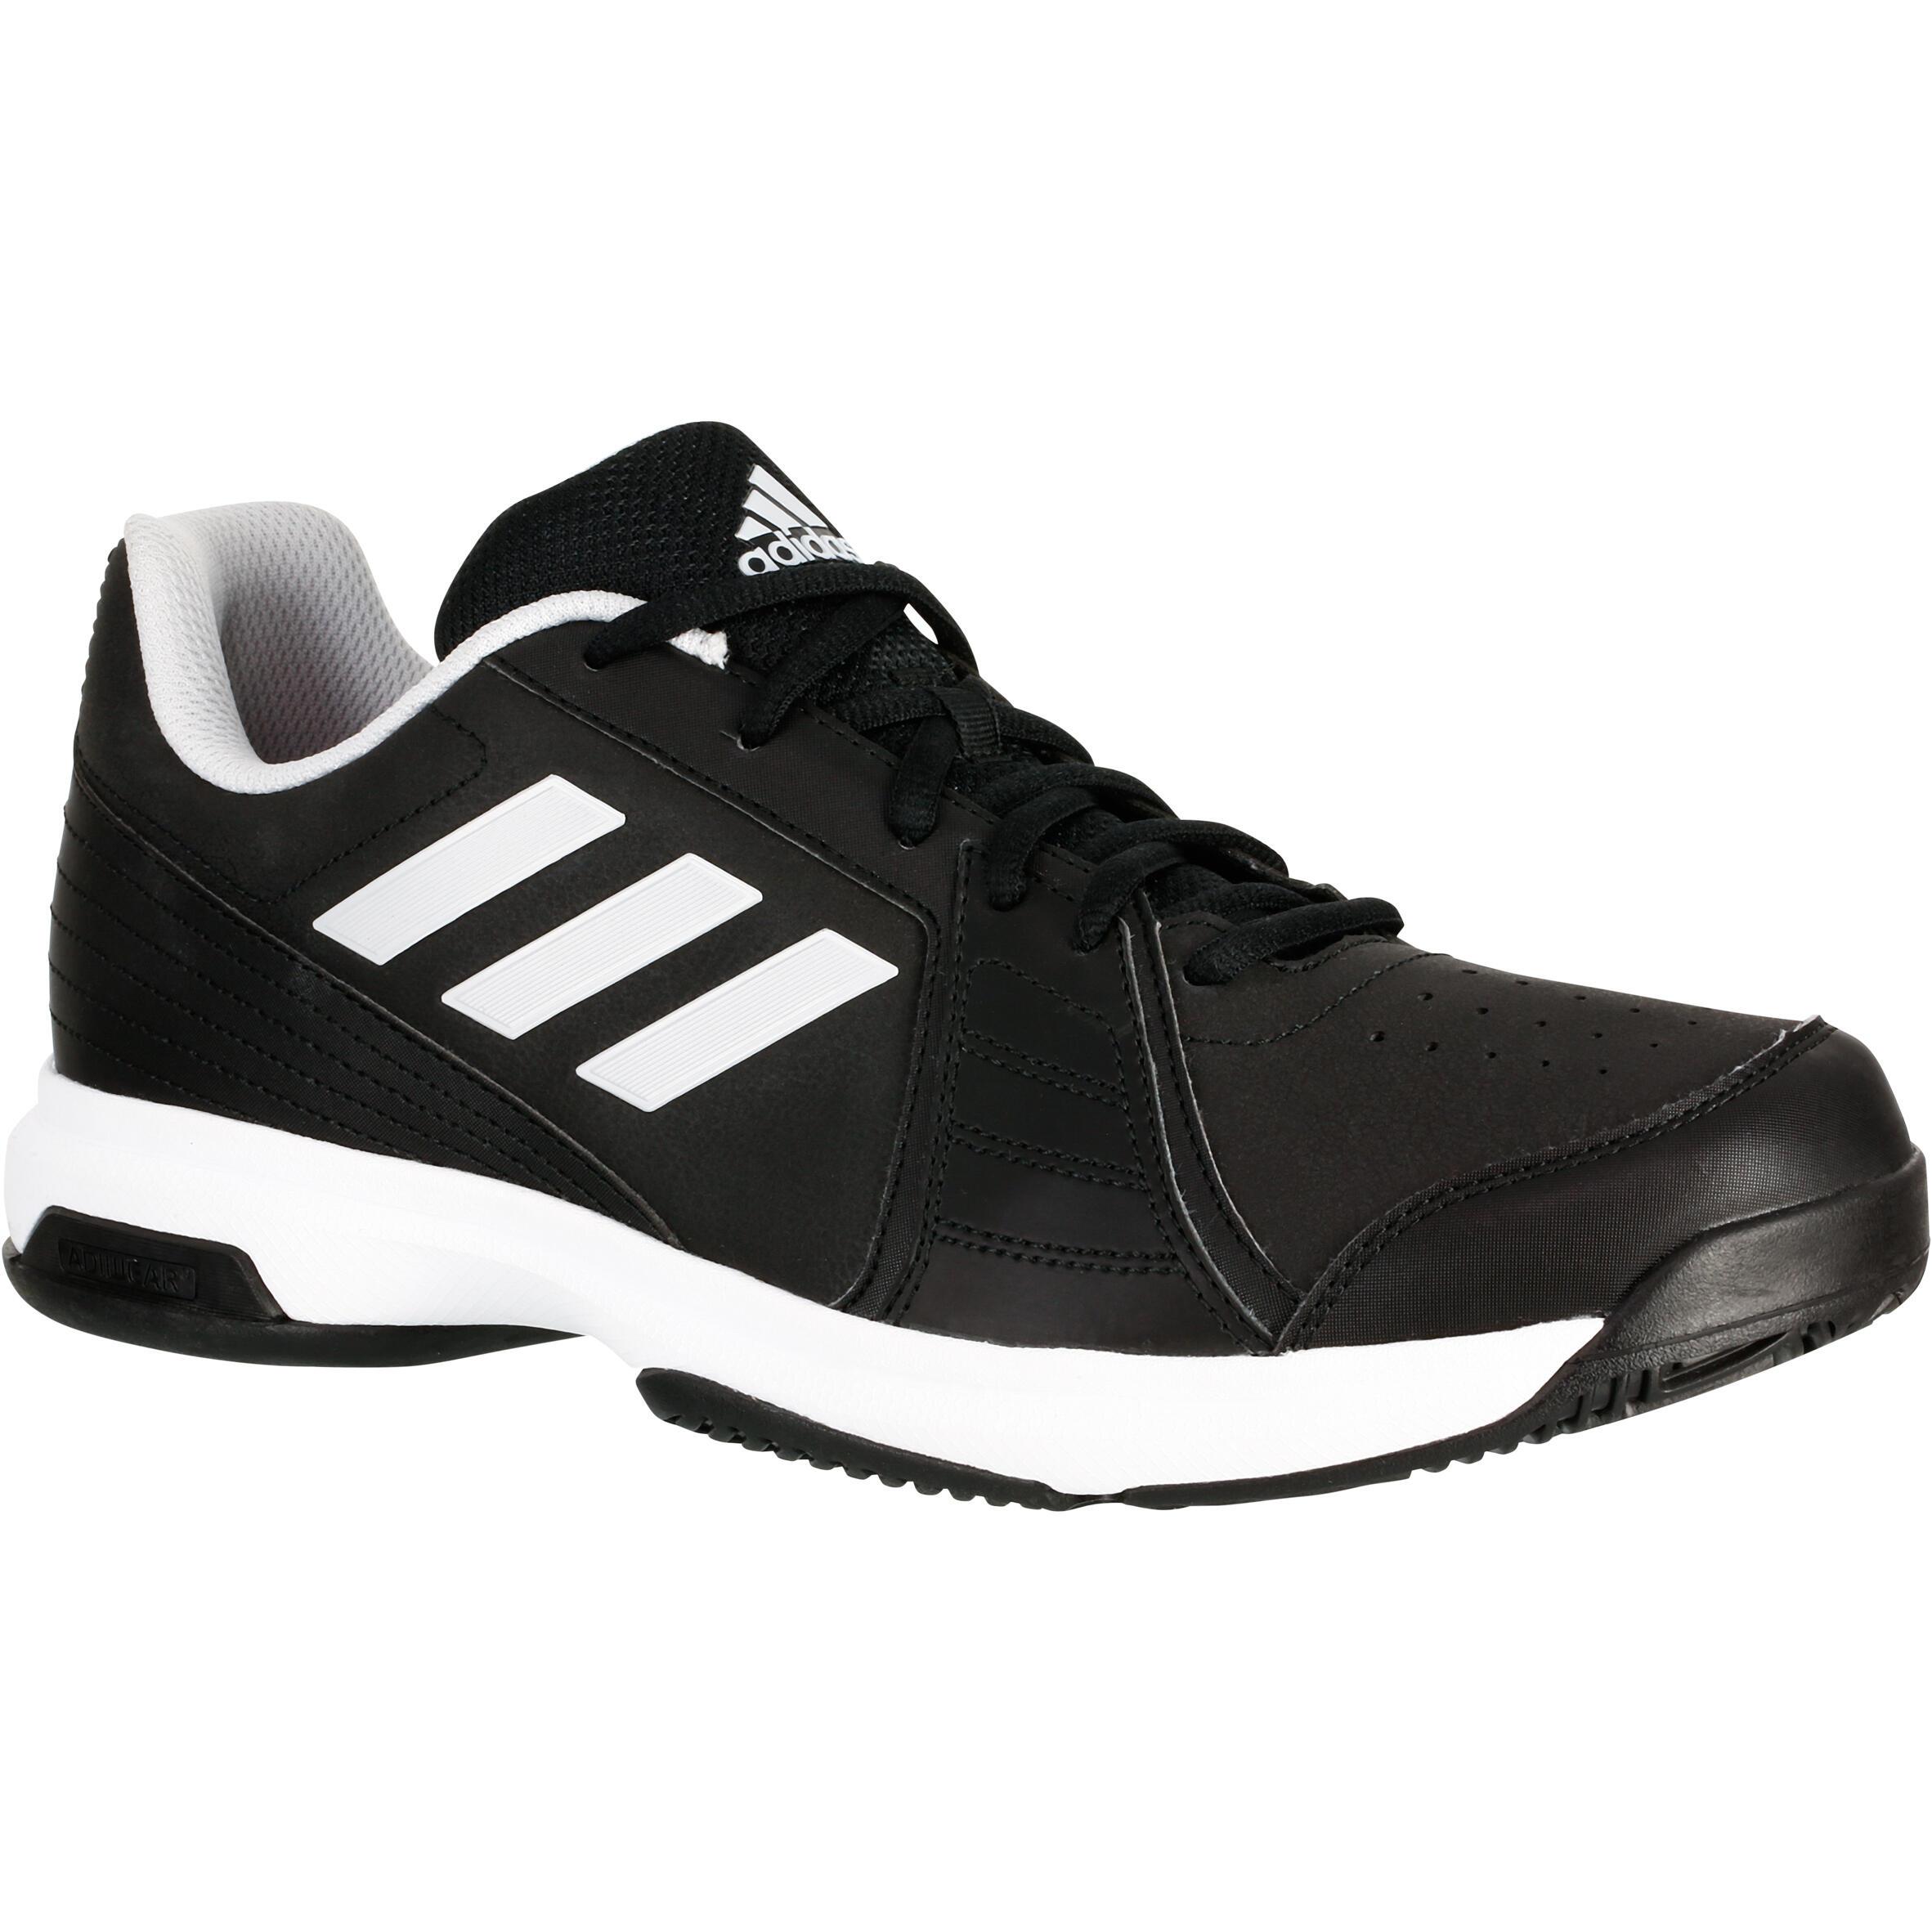 ec0a3da0 Comprar Zapatillas Deportivas de Hombre online | Decathlon